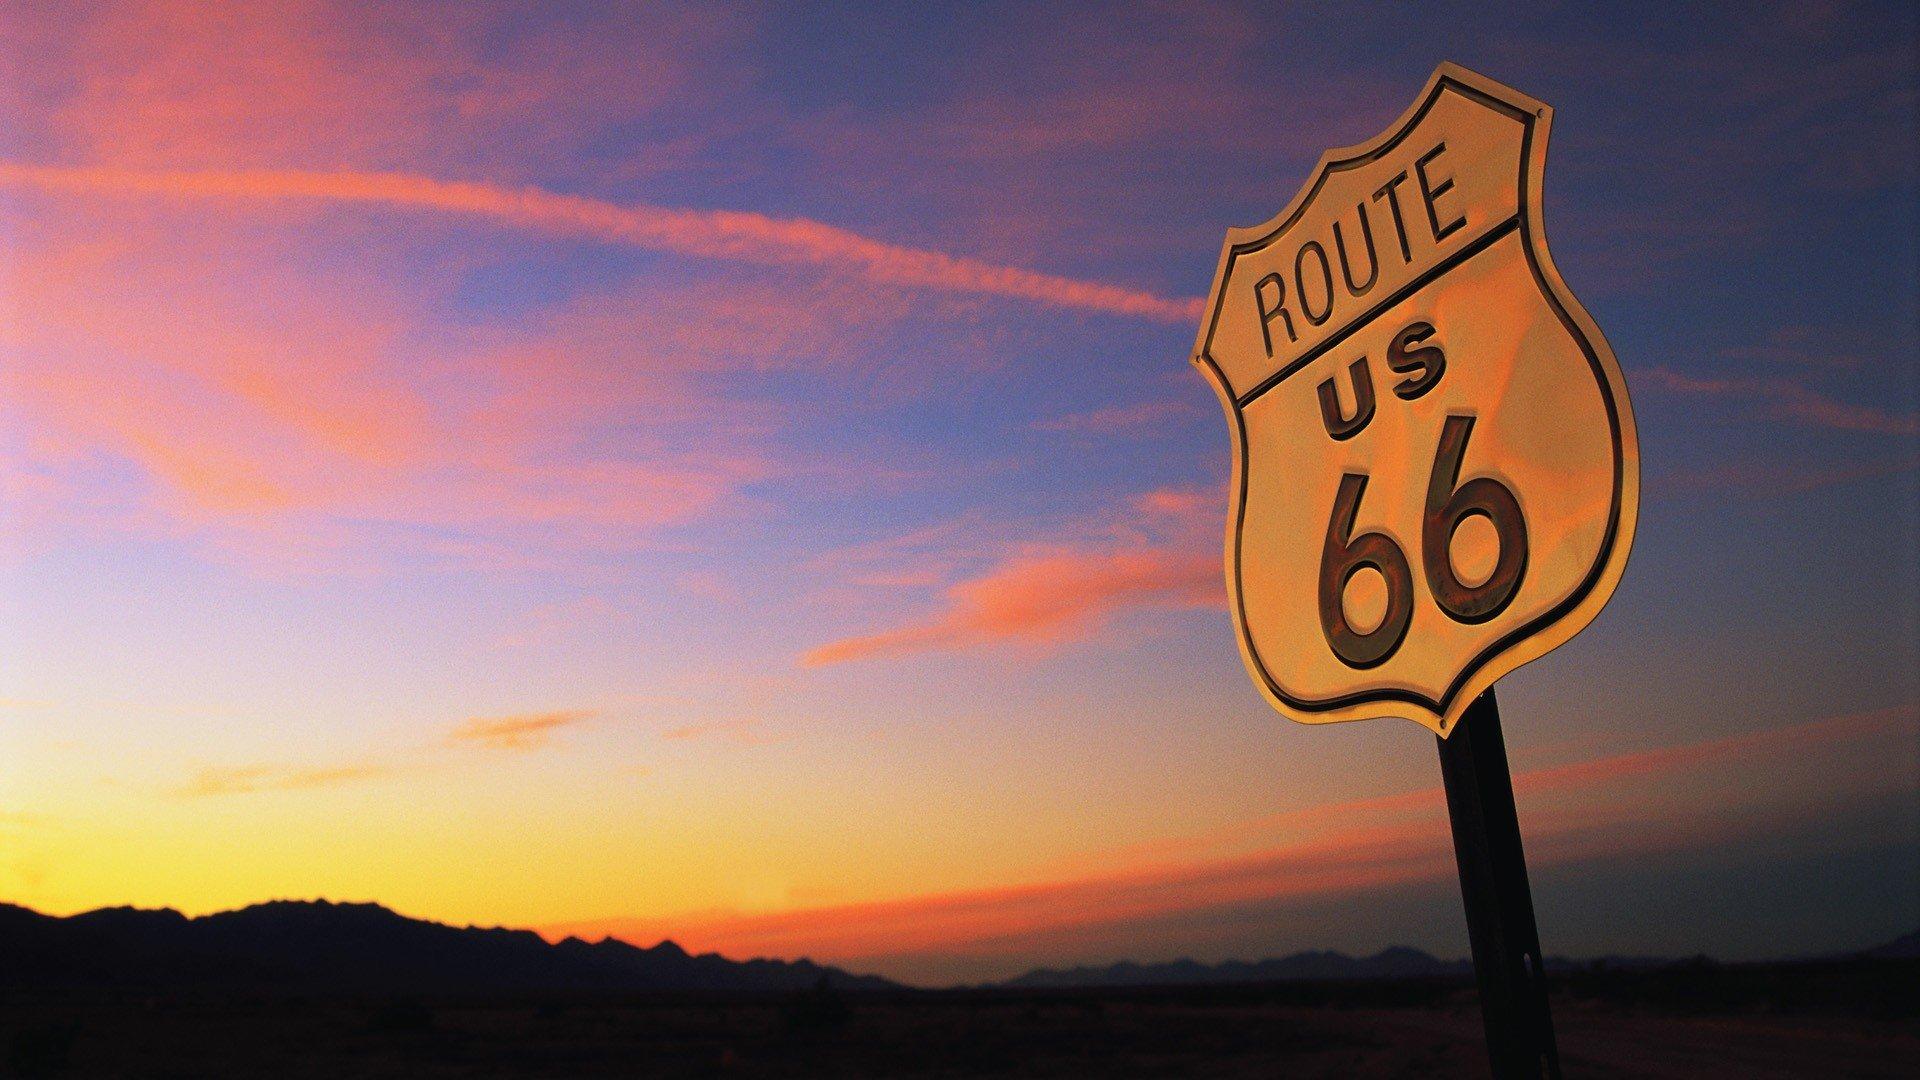 Route 66 wallpaper 1920x1080 246700 WallpaperUP 1920x1080